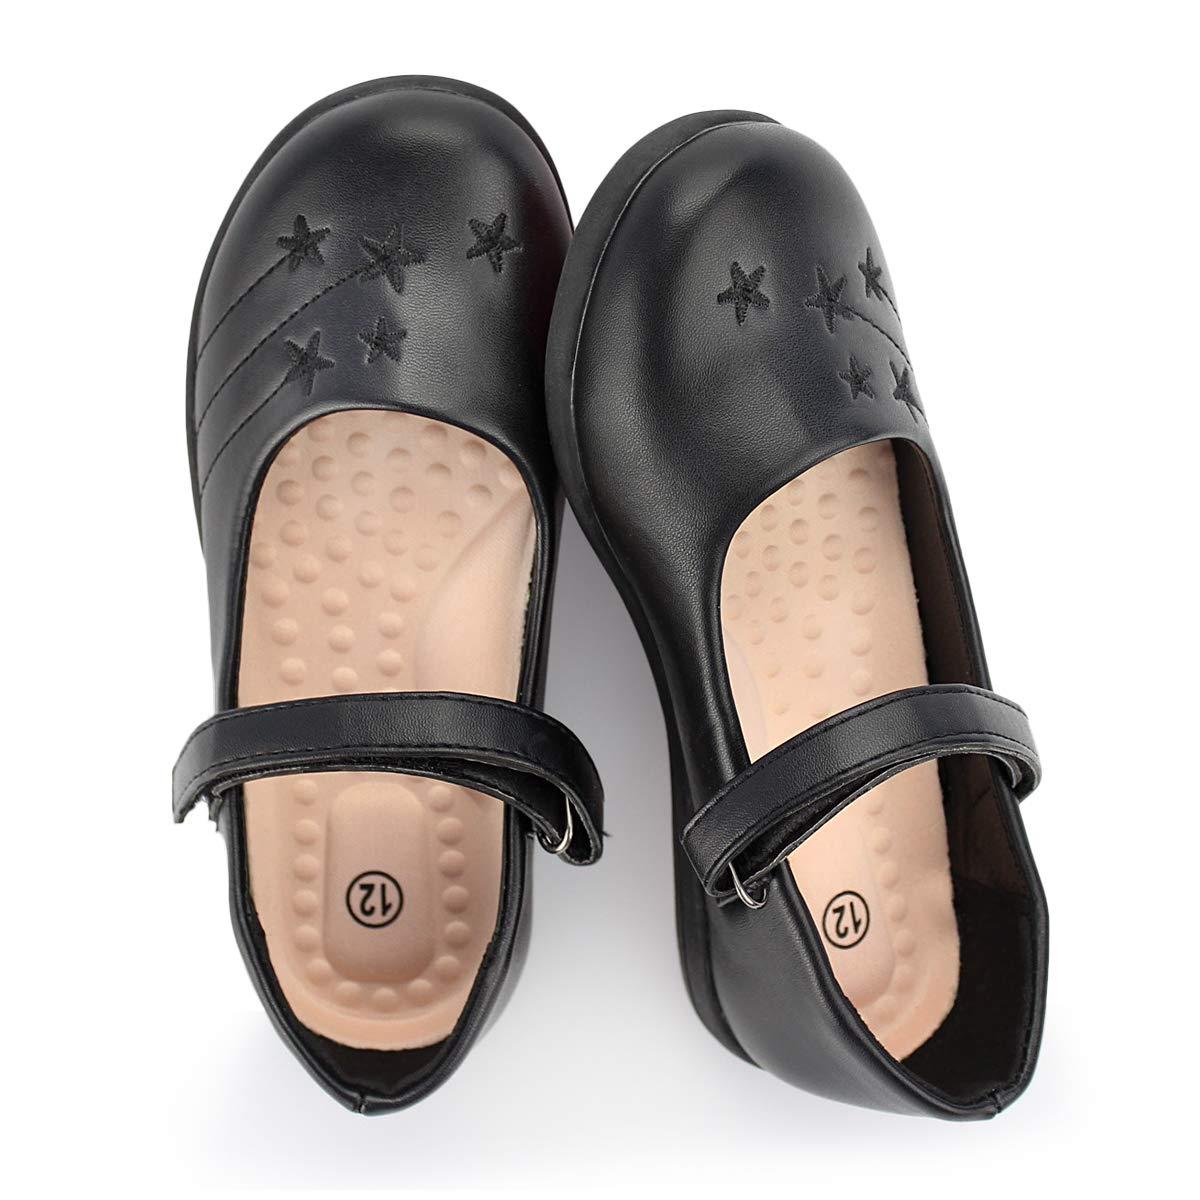 Hawkwell Girls Strap School Uniform Dress Shoe Mary Jane Flat Toddler//Little Kid